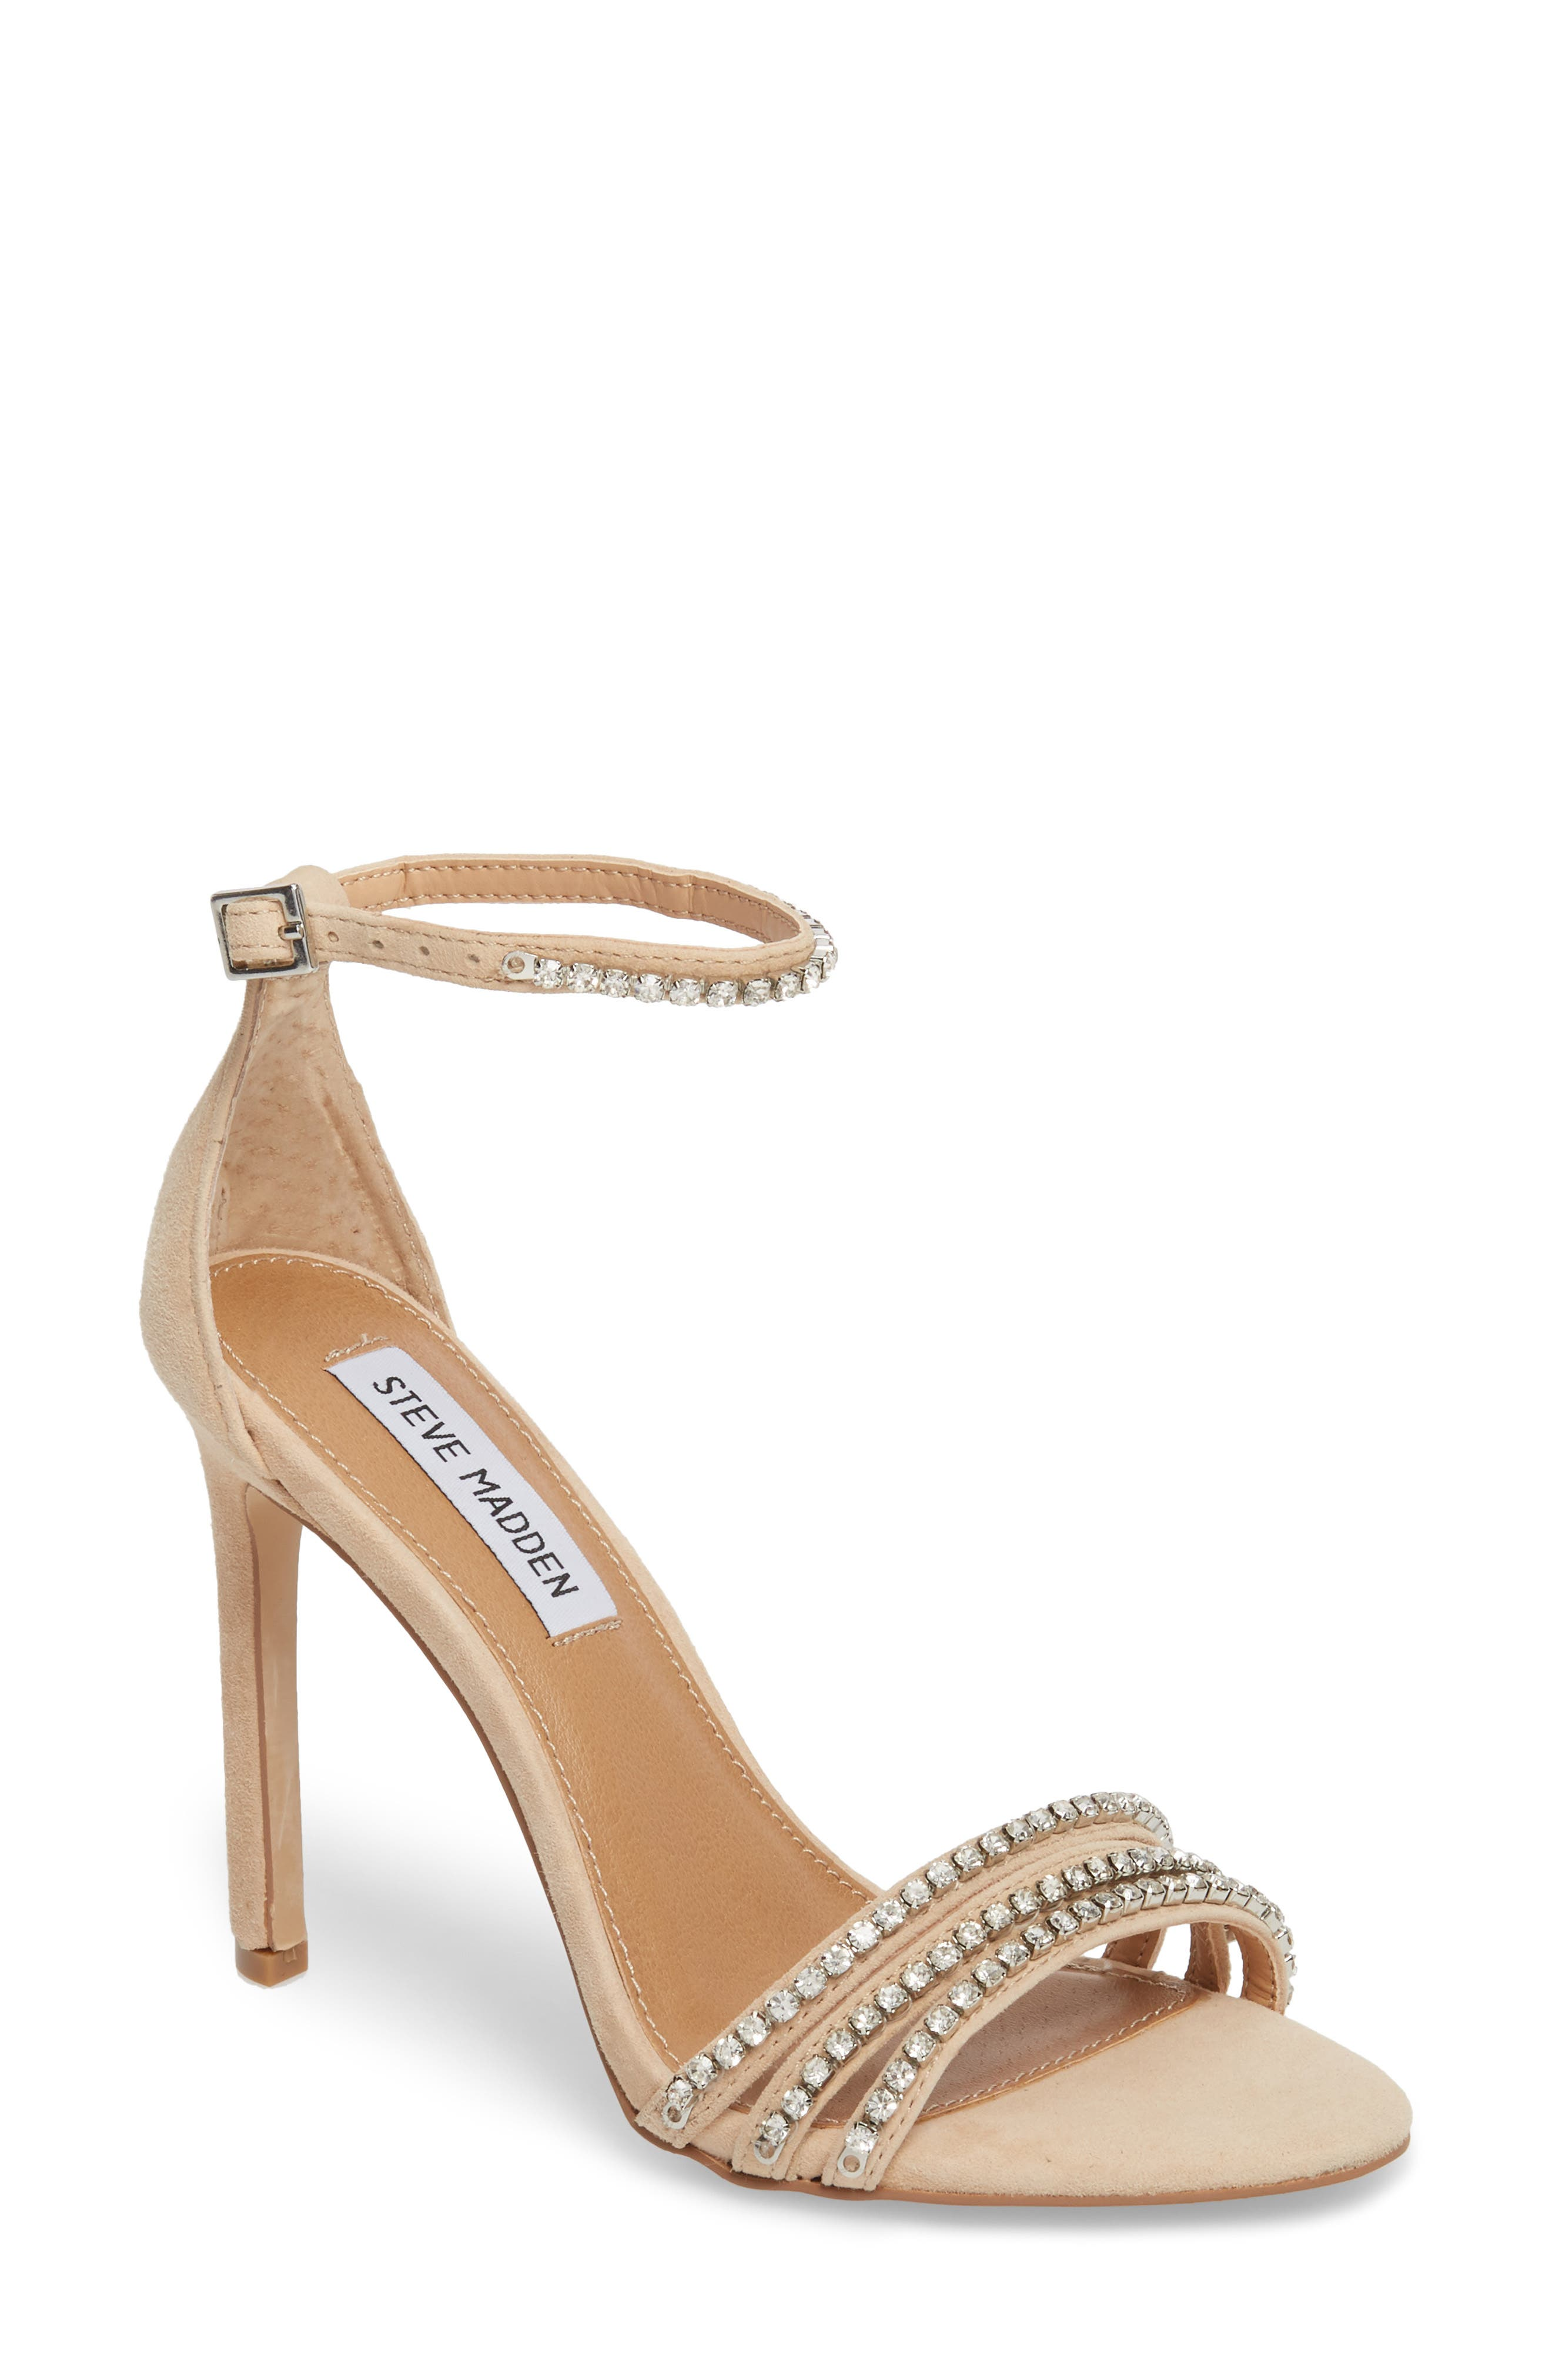 Sterling Embellished Sandal,                             Main thumbnail 1, color,                             Blush Multi